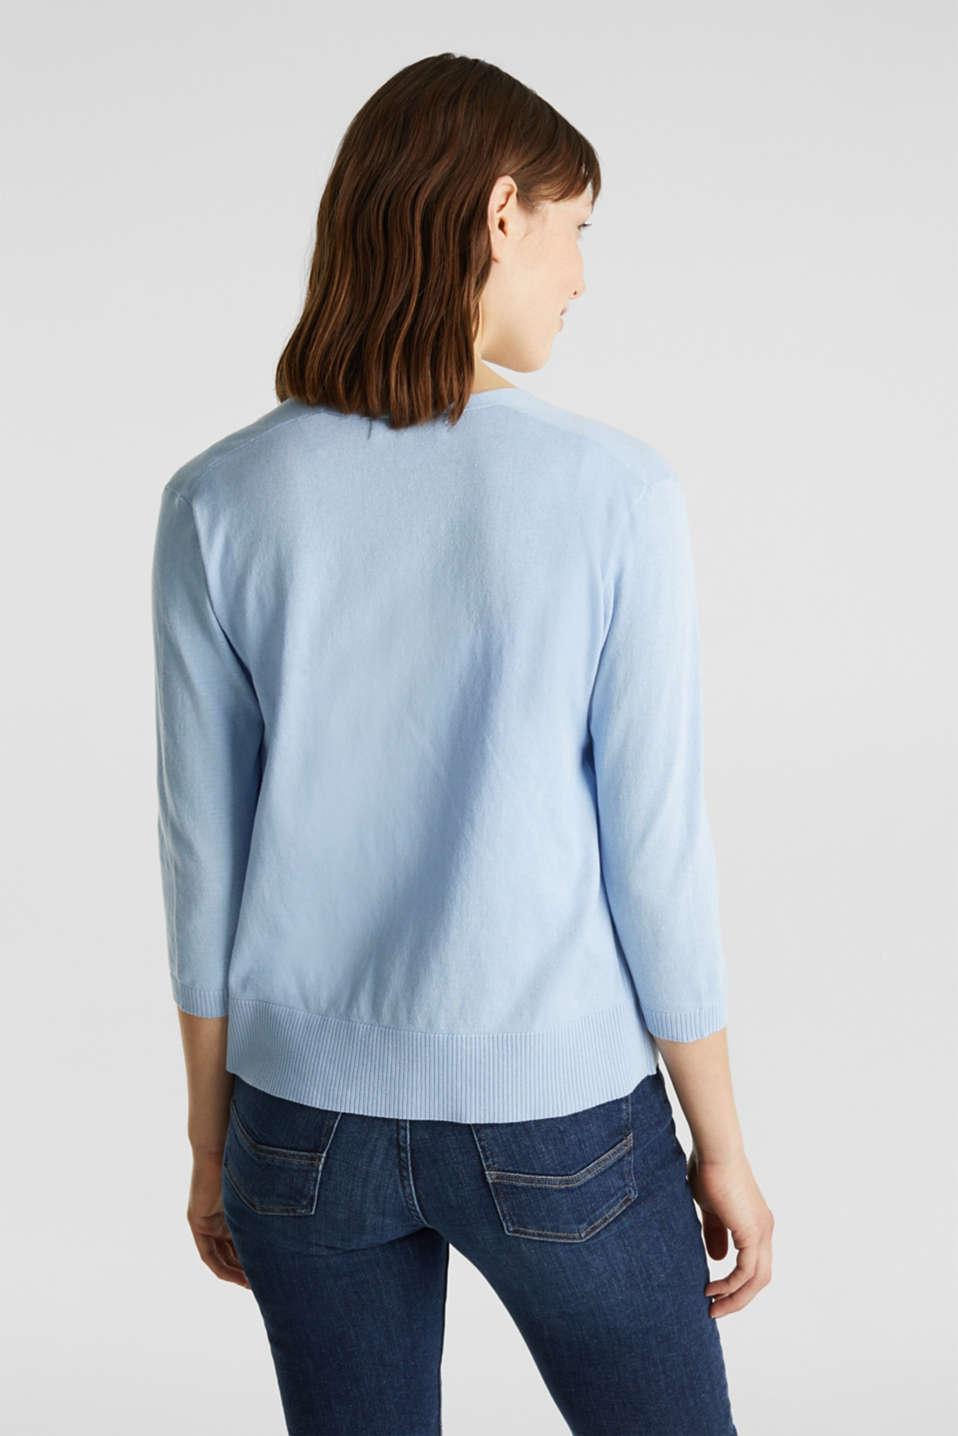 Cardigan made of 100% organic cotton, LIGHT BLUE, detail image number 3